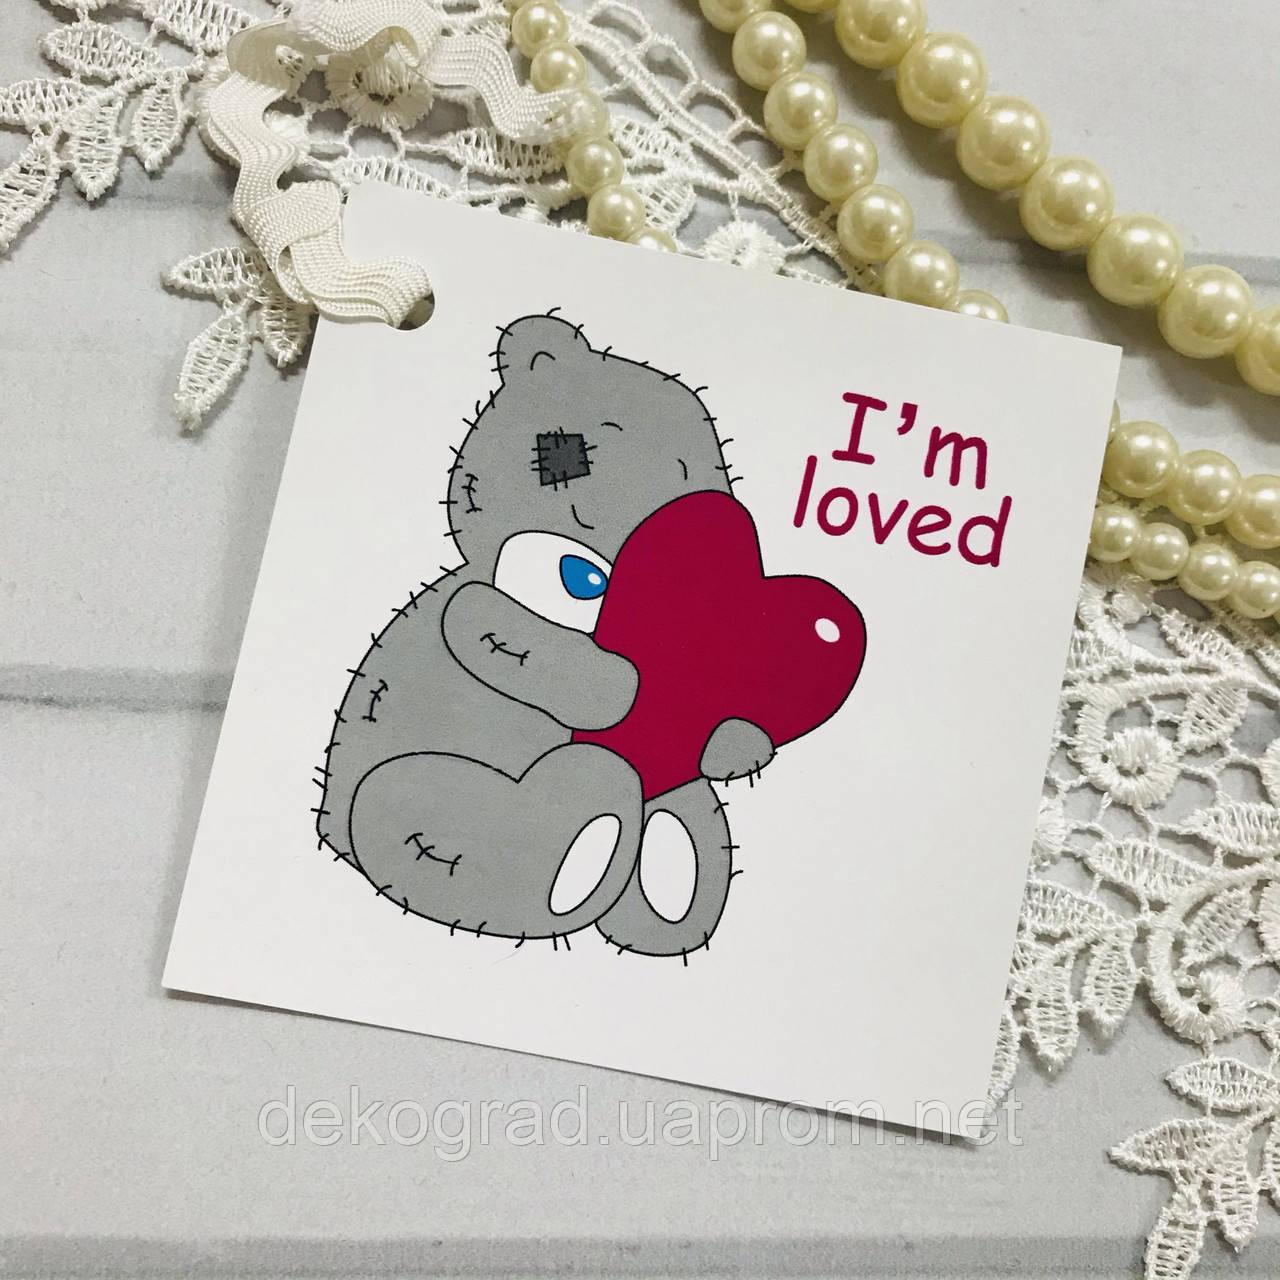 Бирка-открытка для упаковки подарков I'm loved 8x8 см